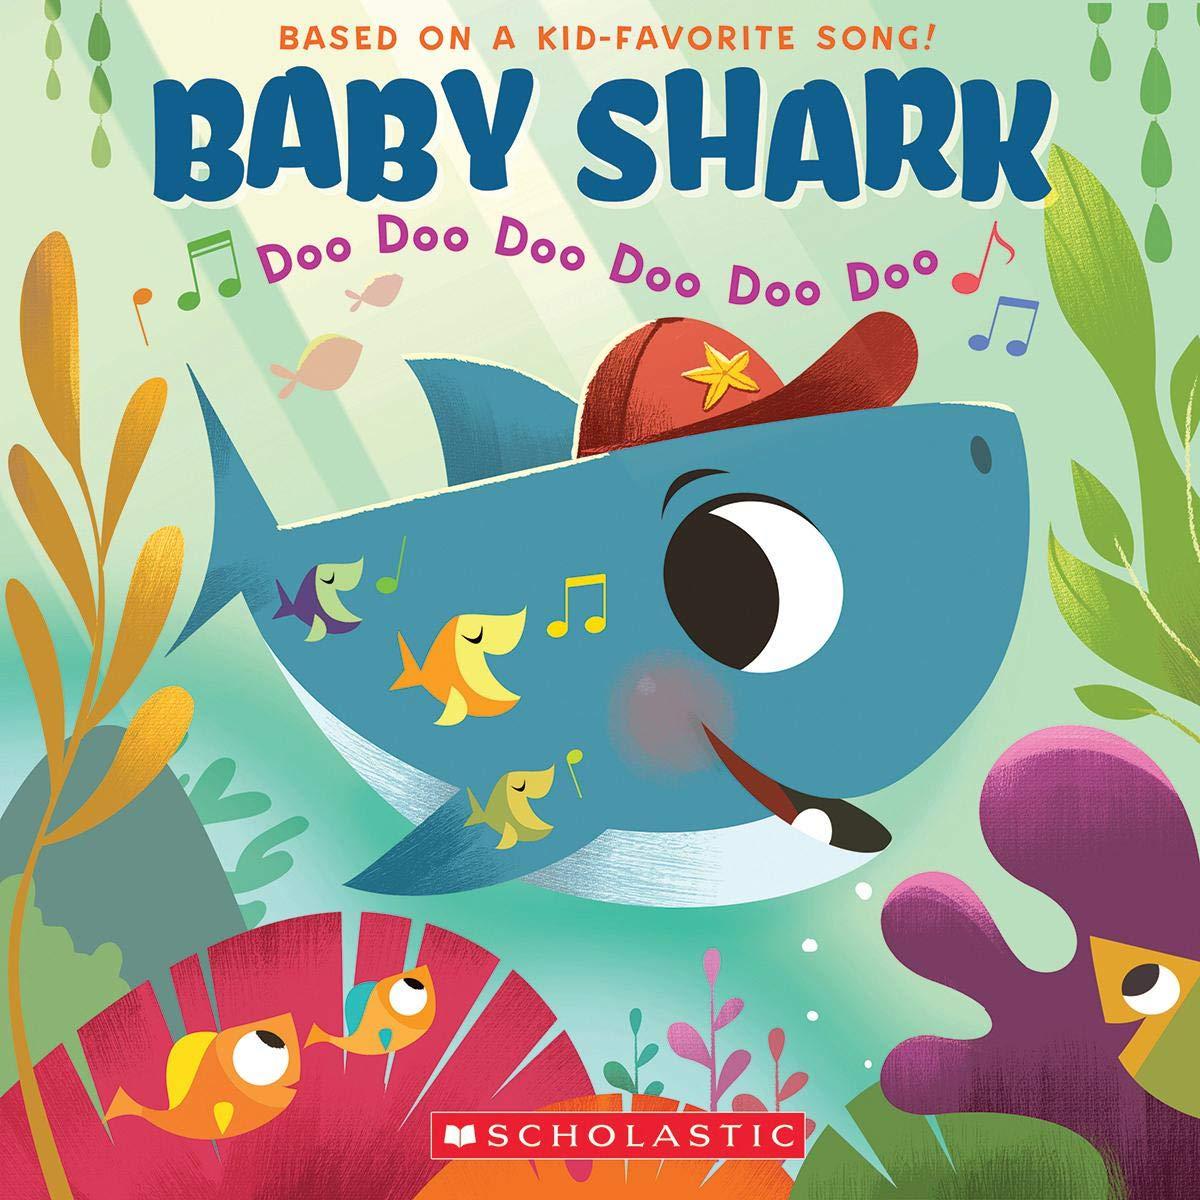 Baby Shark John John Bajet 9781338556056 Amazoncom Books